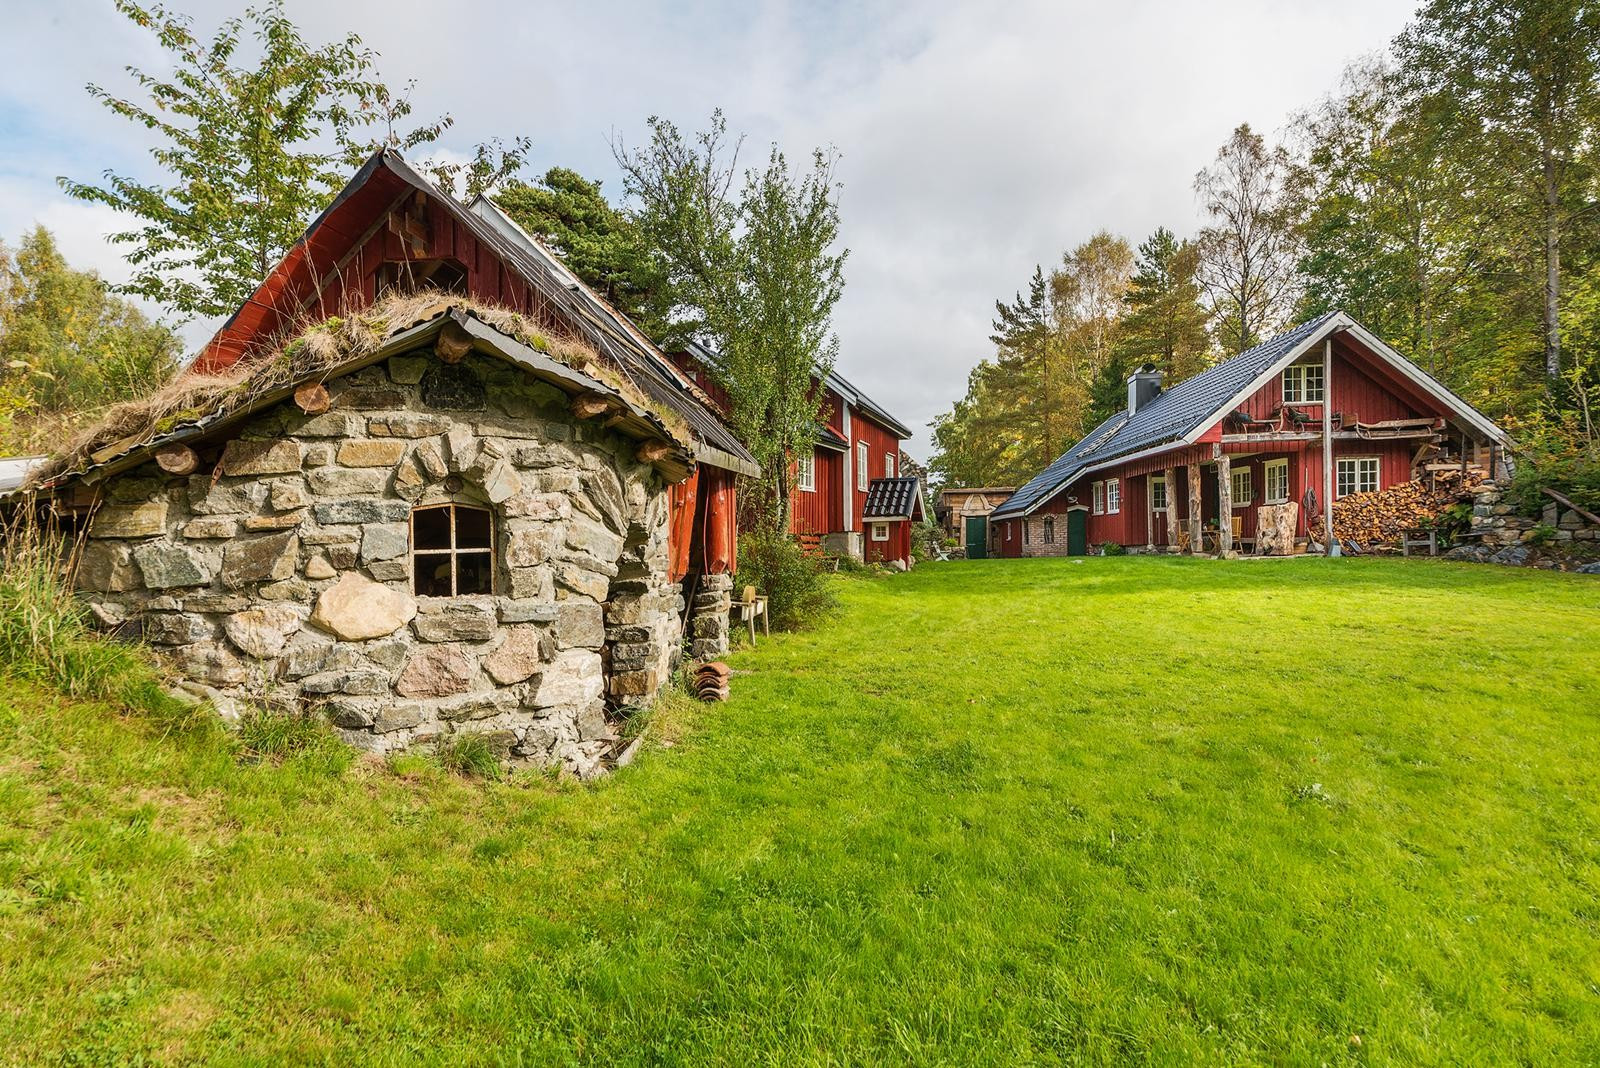 fantastisk-eiendom-med-unike-losninger-denne-ma-sees